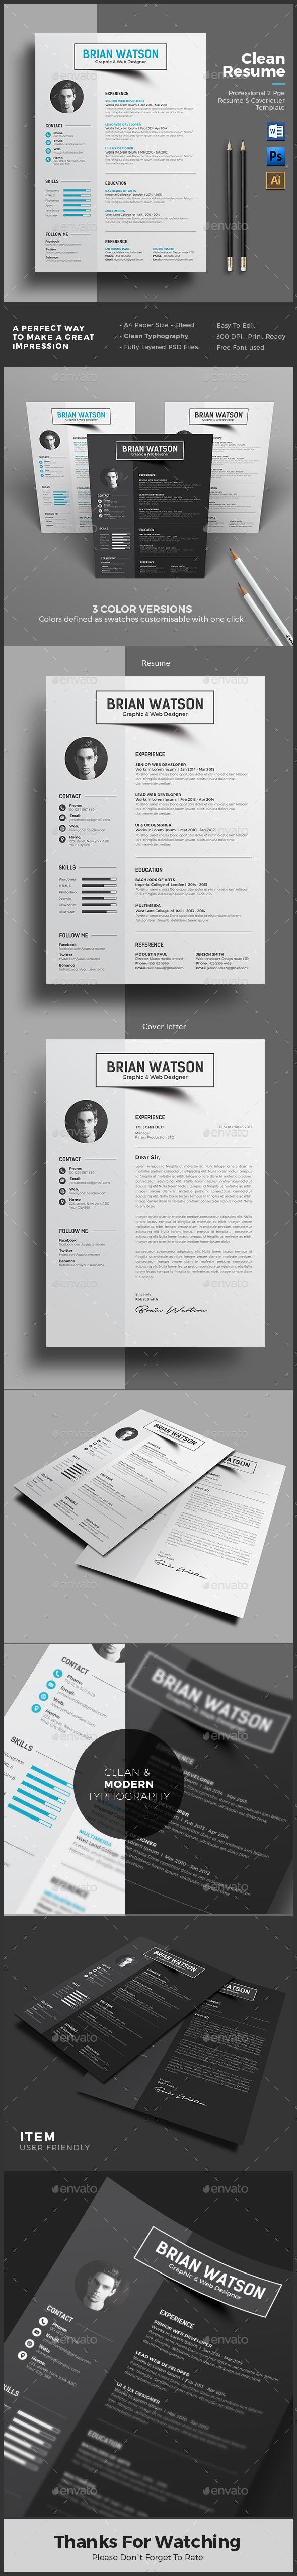 Wonderful 1.5 Binder Spine Template Big 10 Minute Resume Builder Regular 2 Inch Heart Template 2 Page Resume Design Young 2014 Calendar Template Monthly Purple2015 Calendar Word Template 25  Best Ideas About Best Resume Template On Pinterest | Best Cv ..